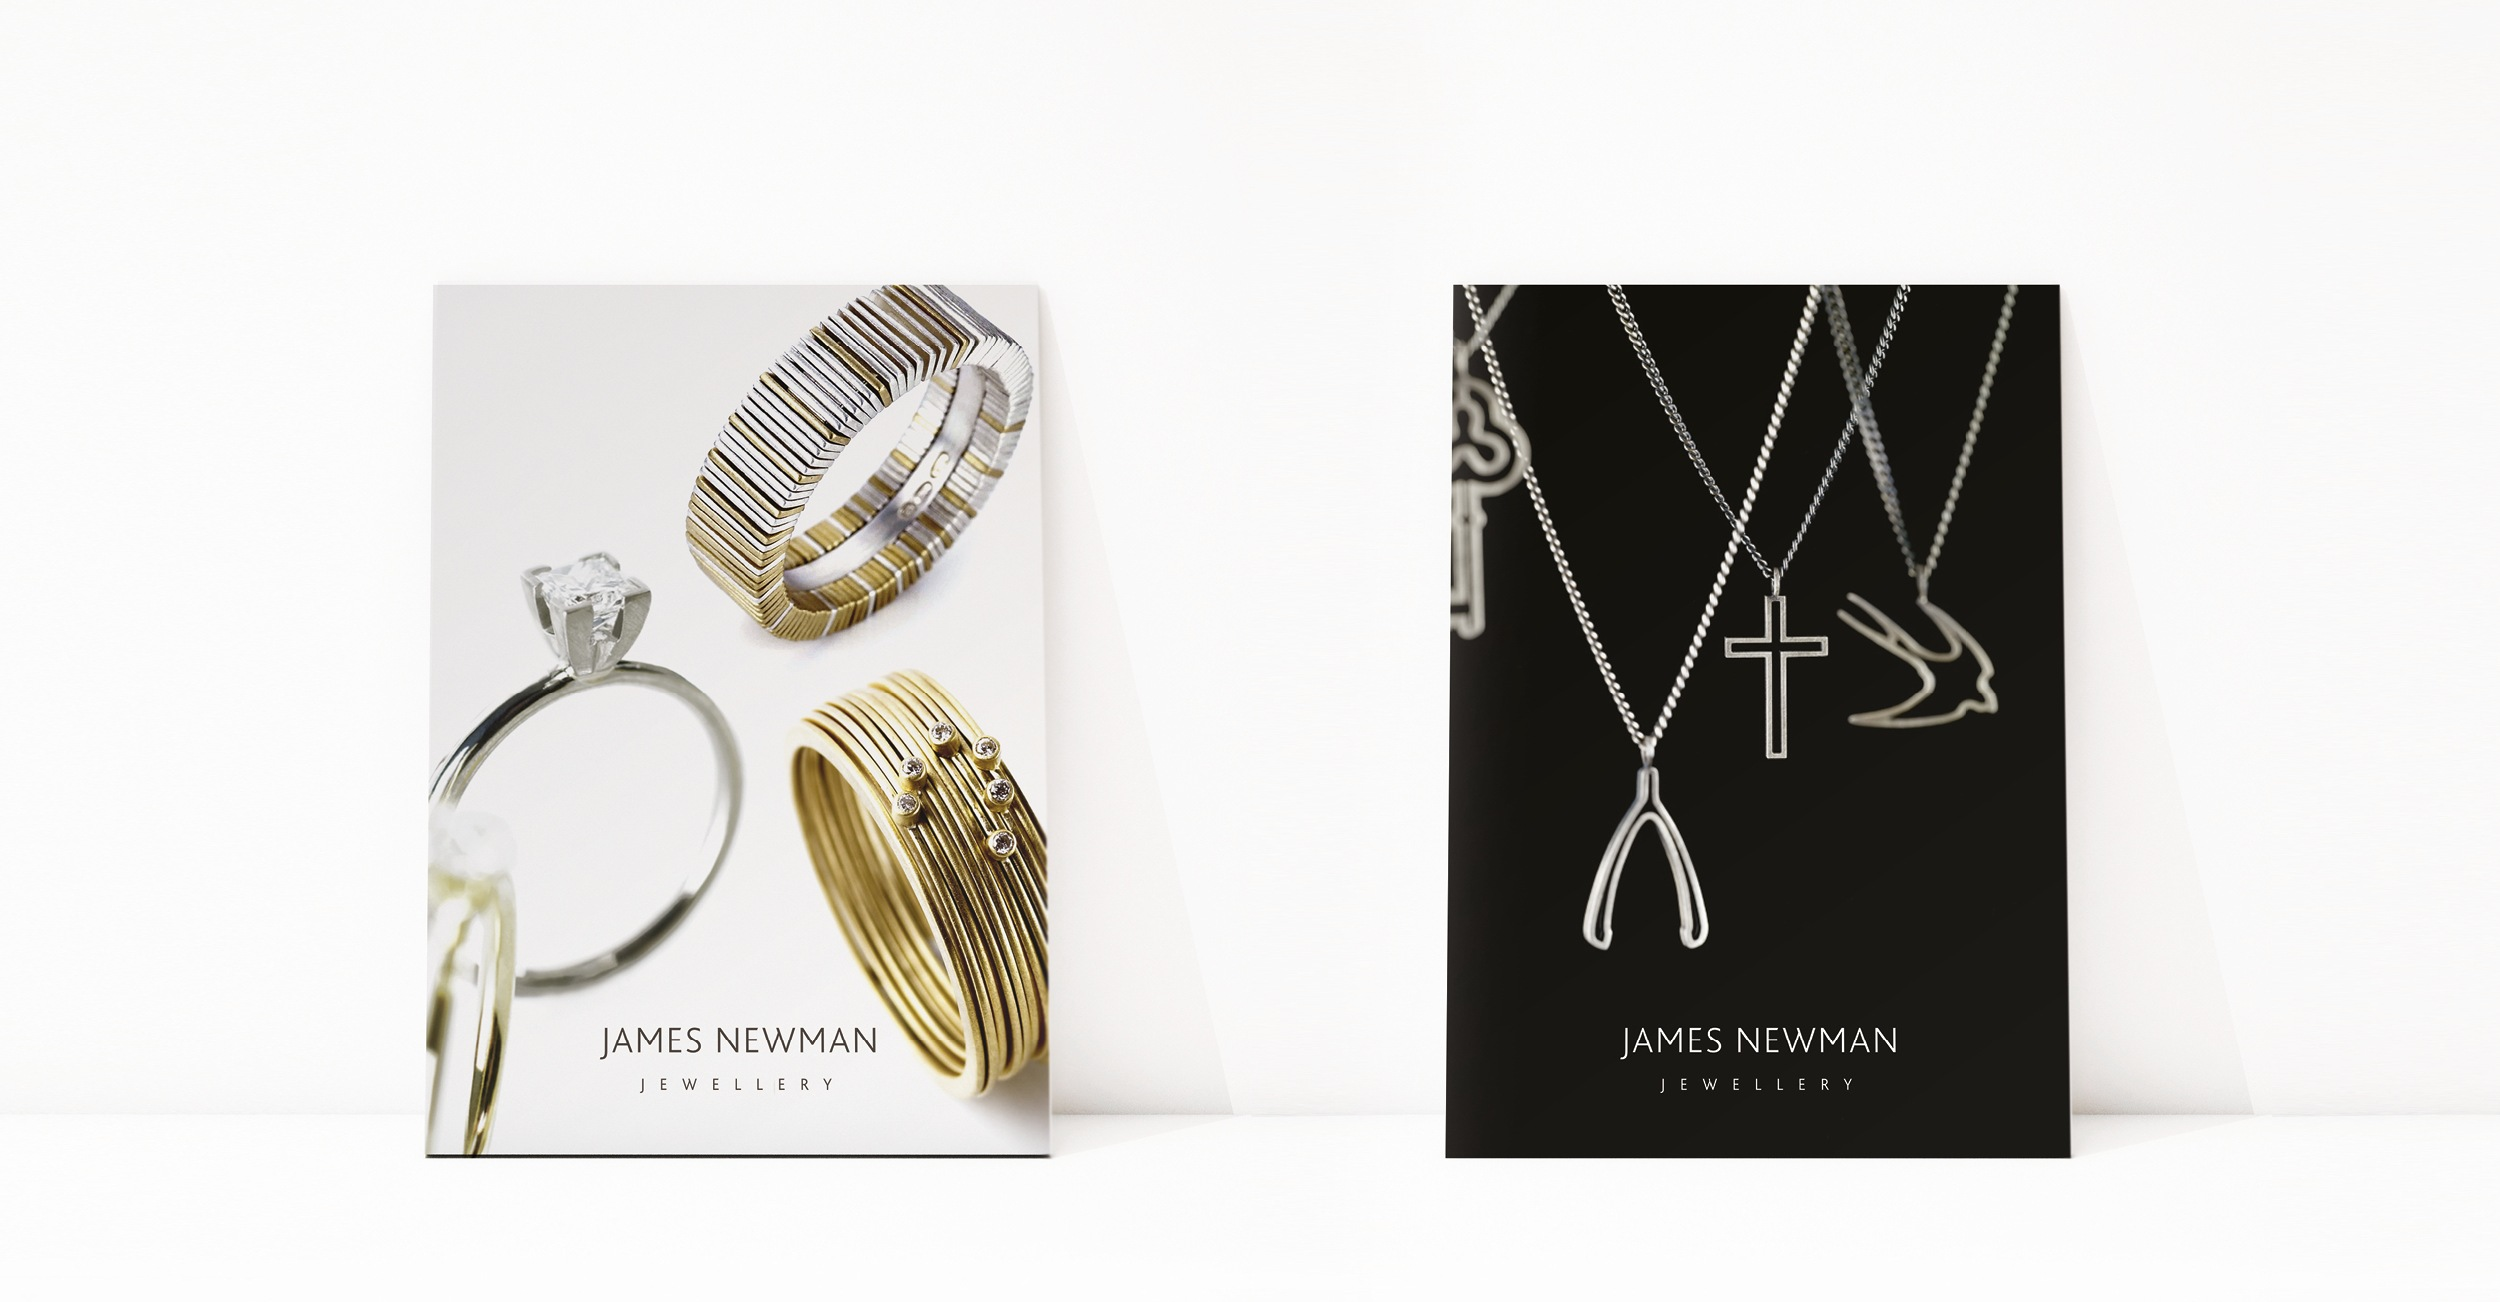 James Newman Jewellery - Advertising / Flyer Design